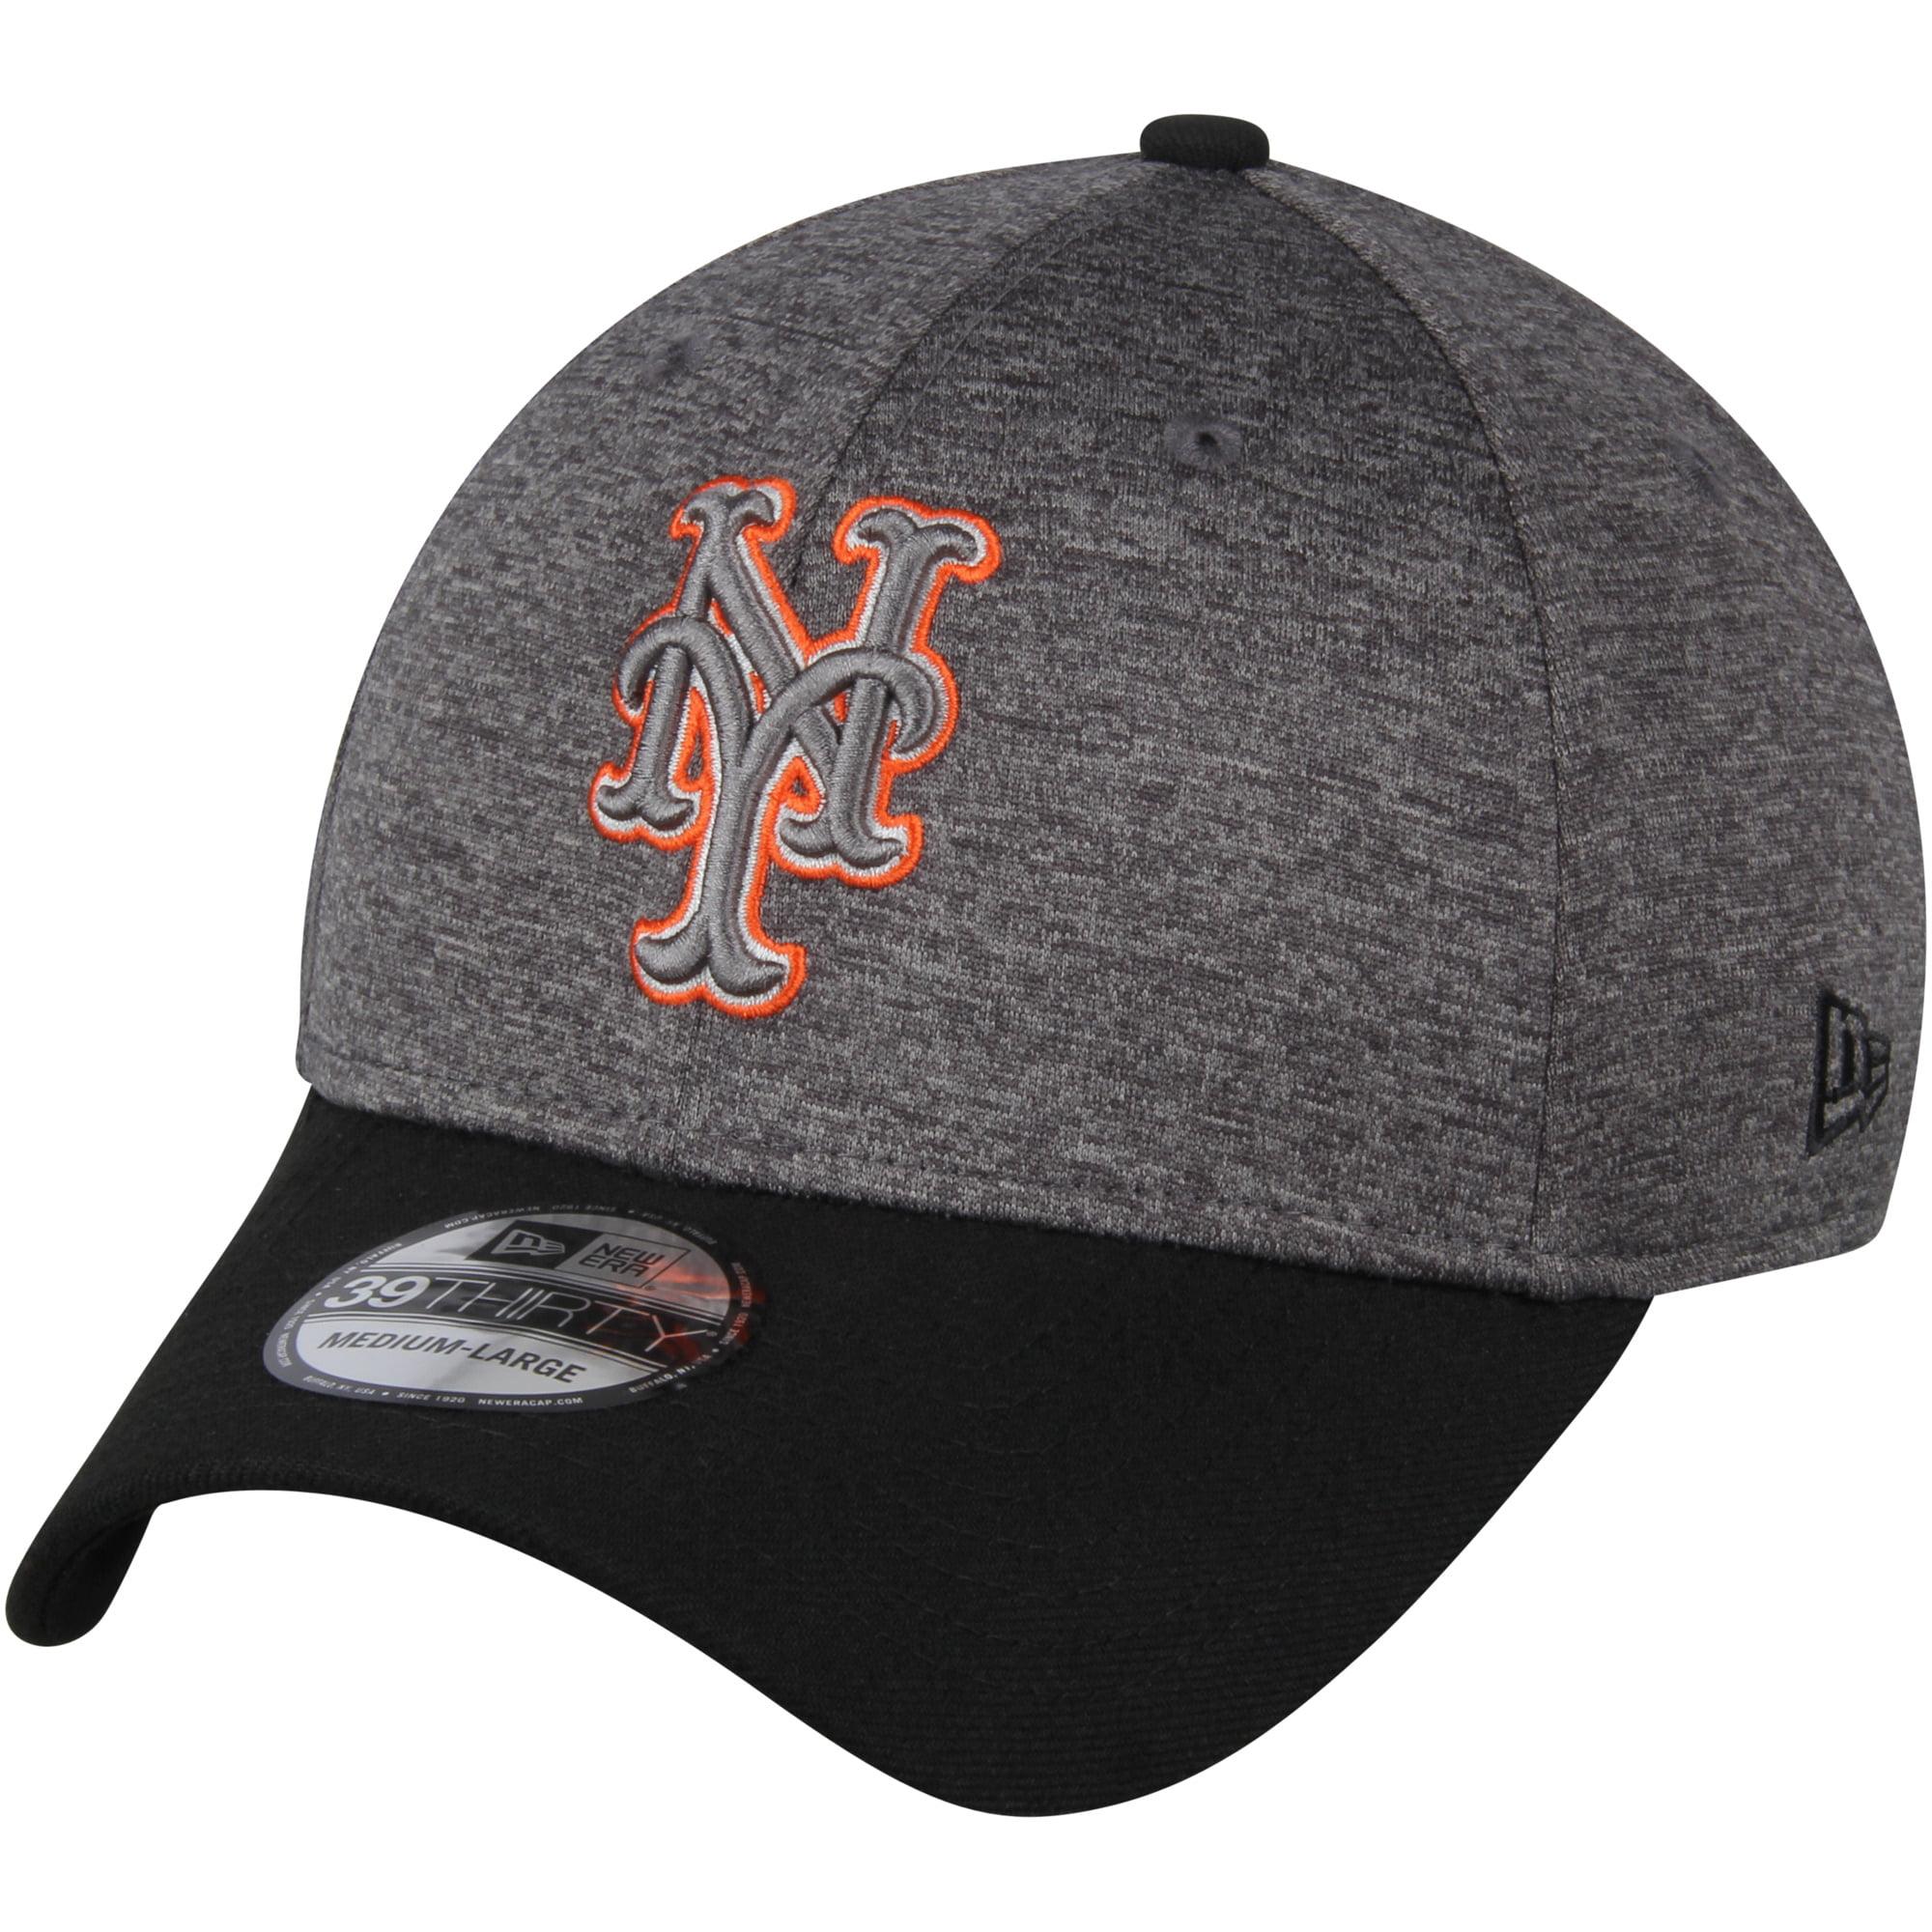 New York Mets New Era 39THIRTY Shadow Tech Color Pop Flex Hat - Heathered  Gray Black b07f36e4411